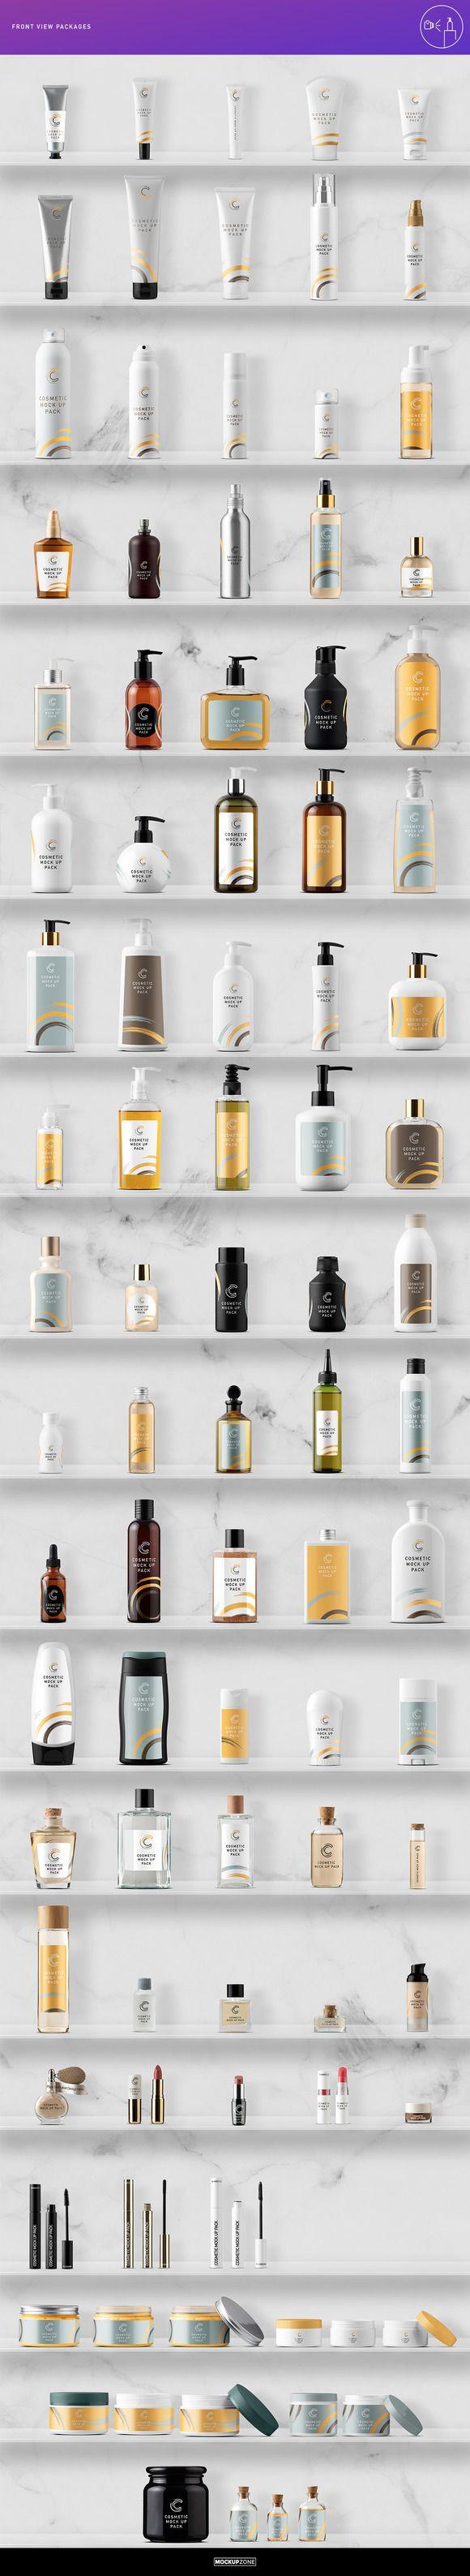 Cosmetic Packaging Branding MockUp ~ Product Mockups on Creative Market